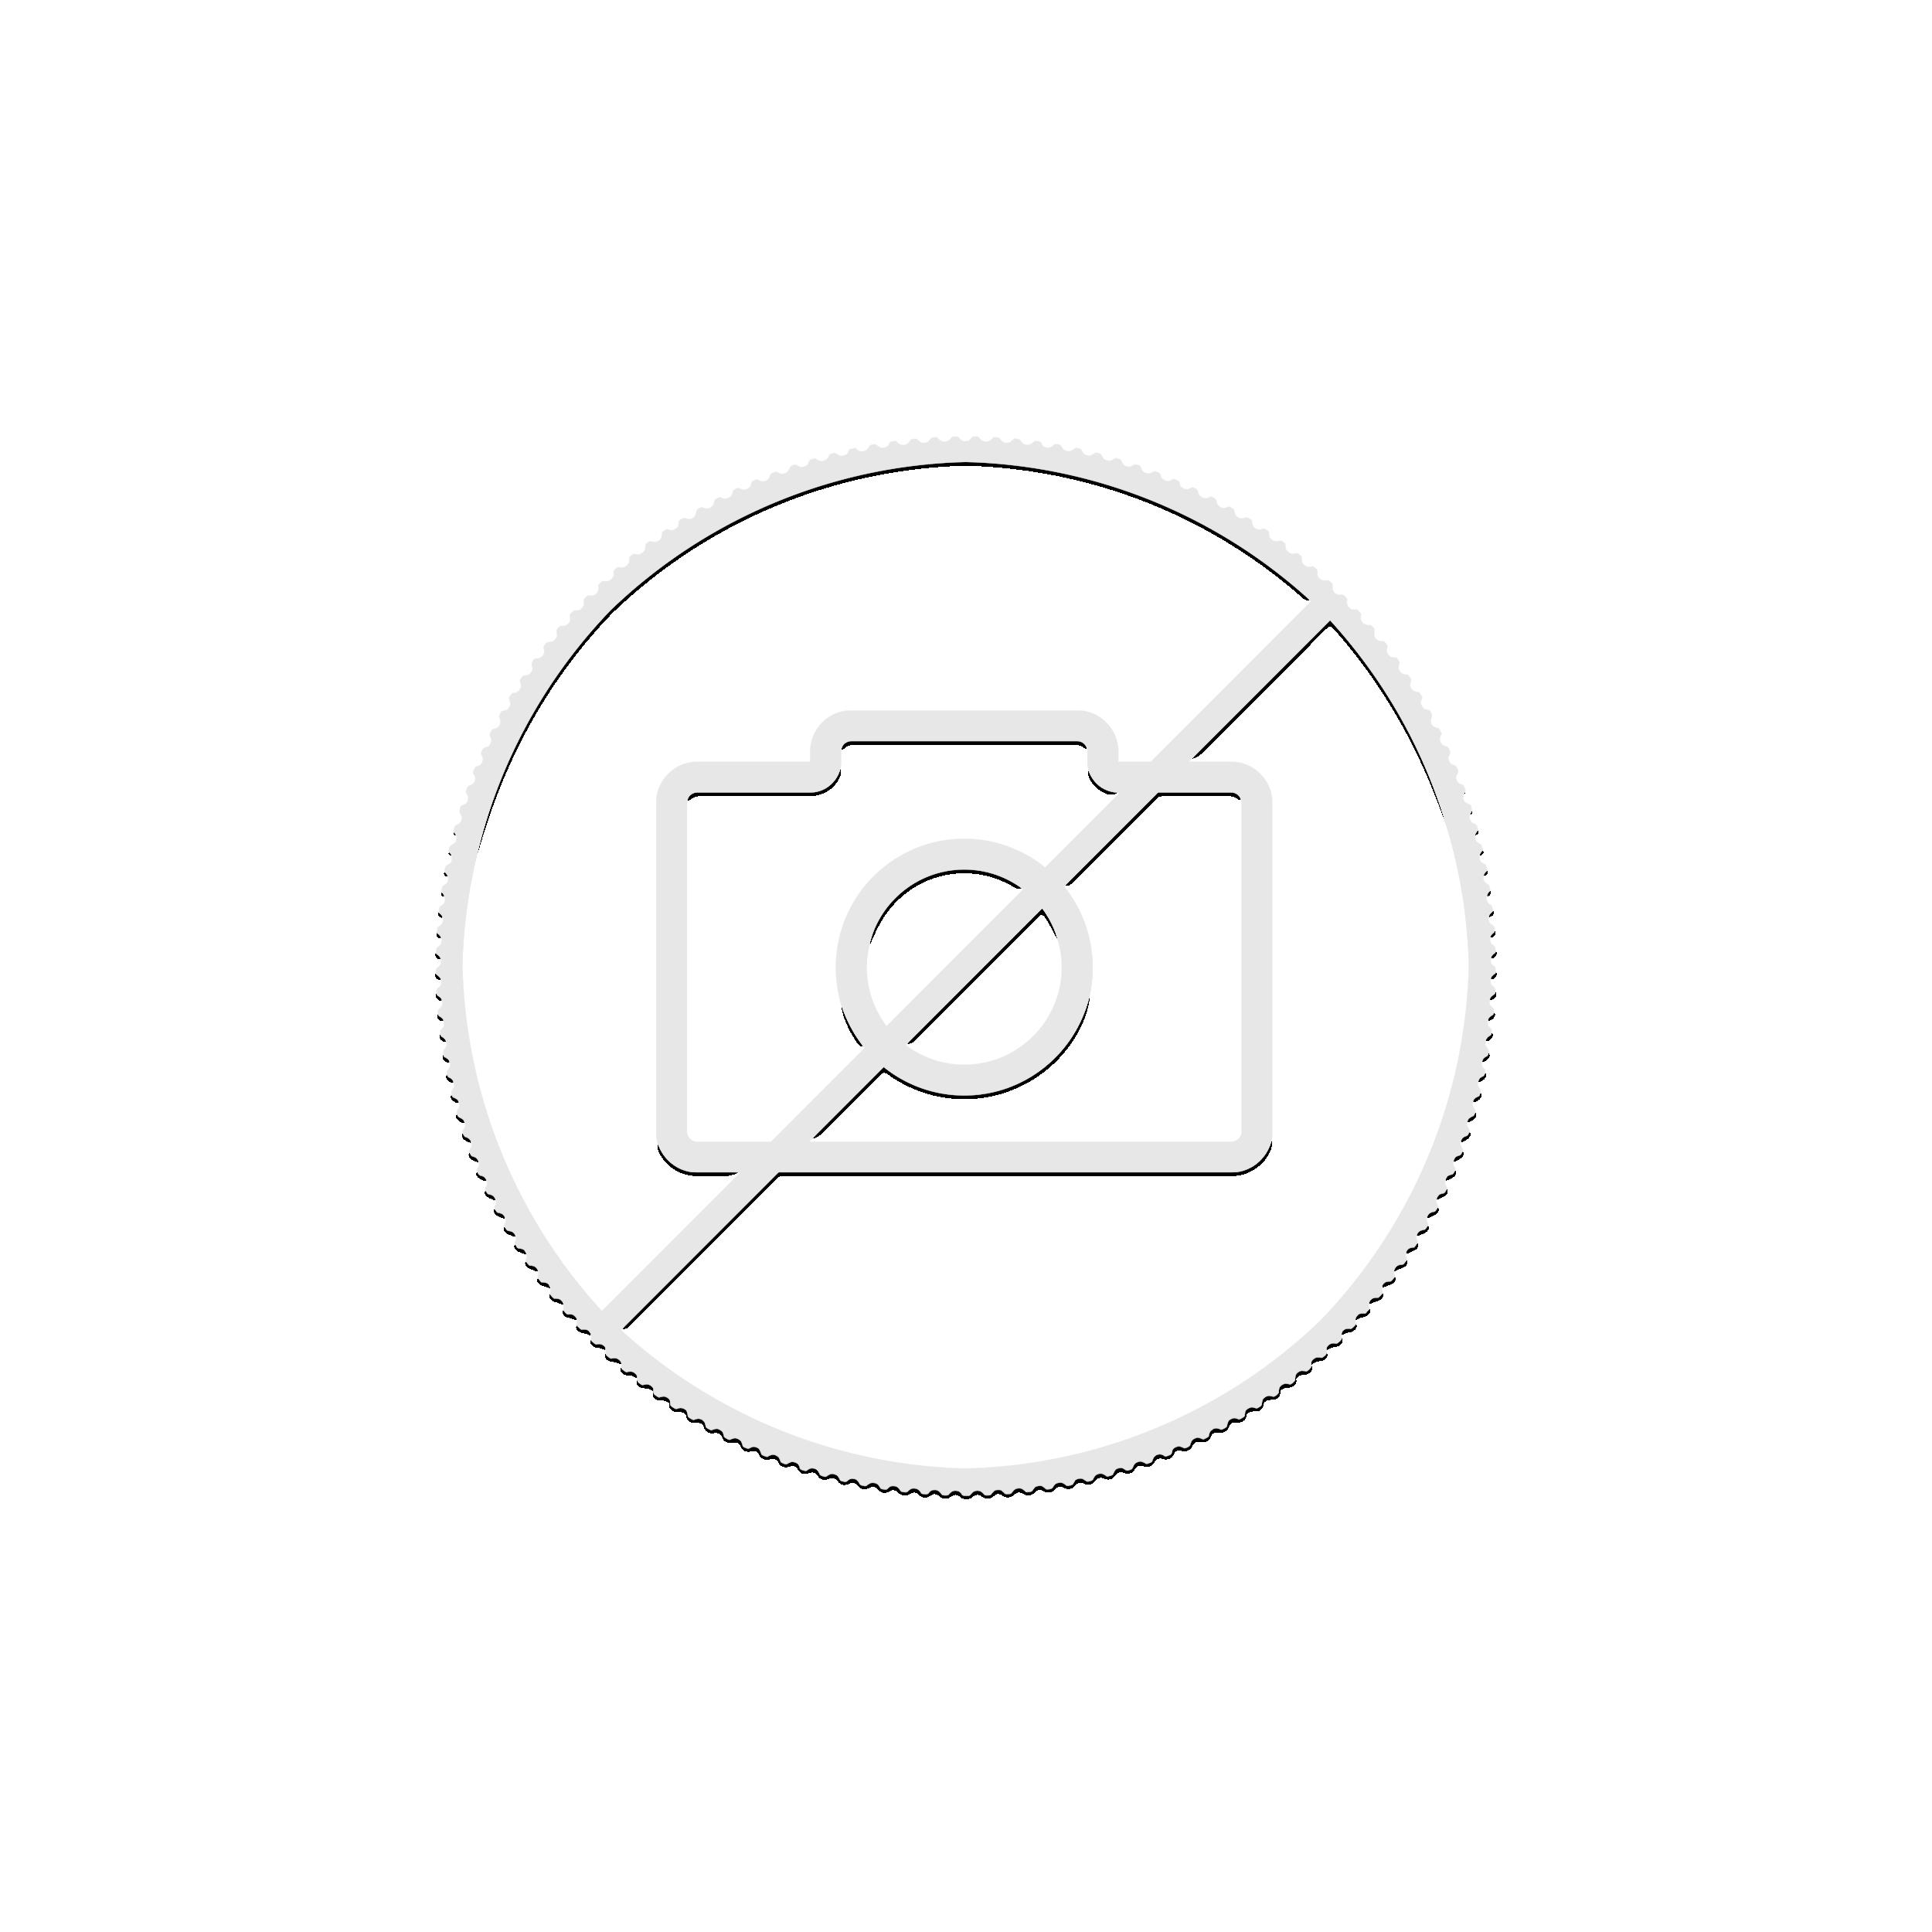 1 troy ounce zilveren Funnelweb Spider munt